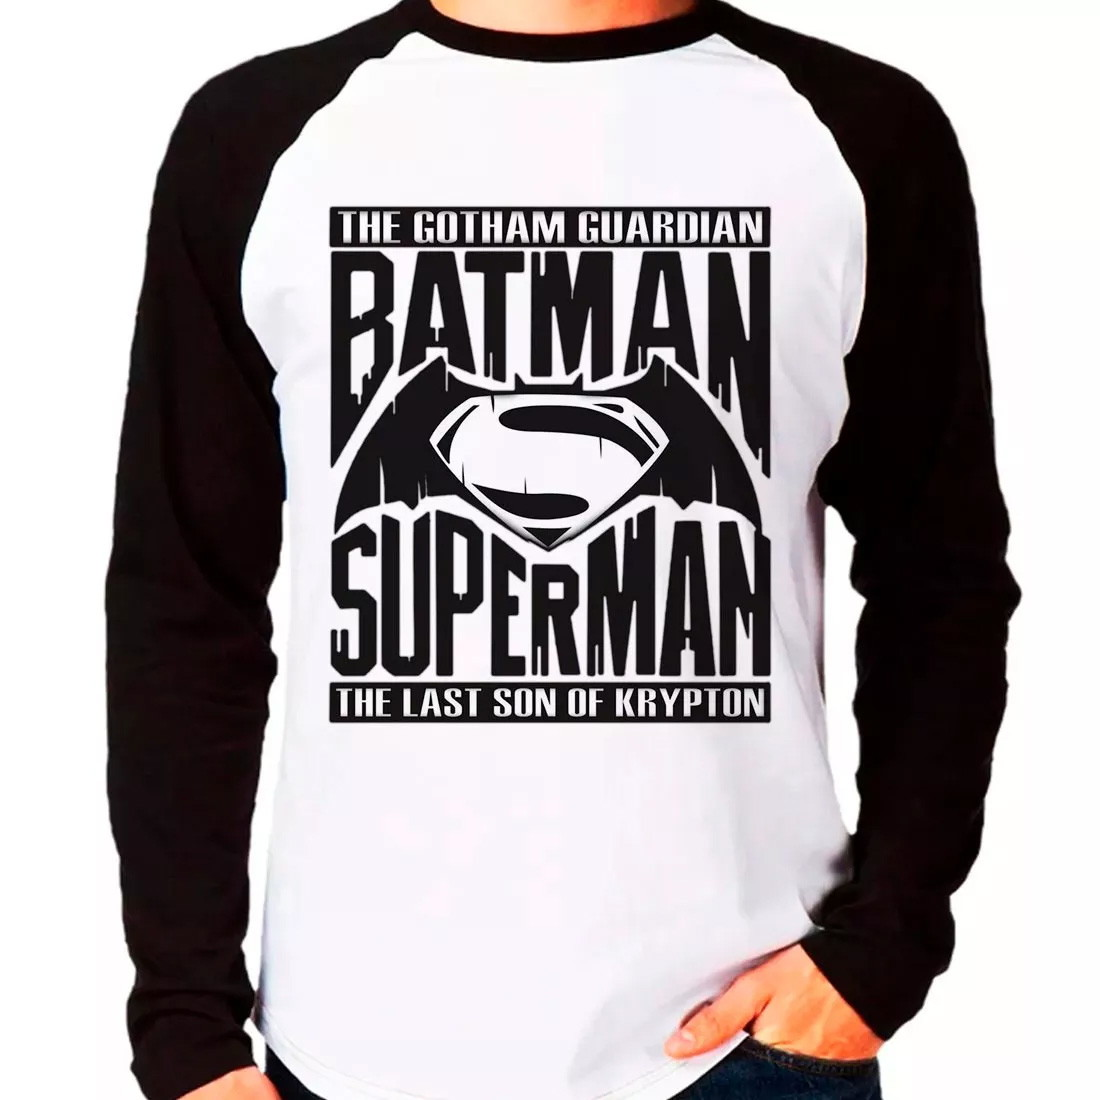 91bfd84fe7 Camiseta Batman Vs Superman Manga Longa no Elo7